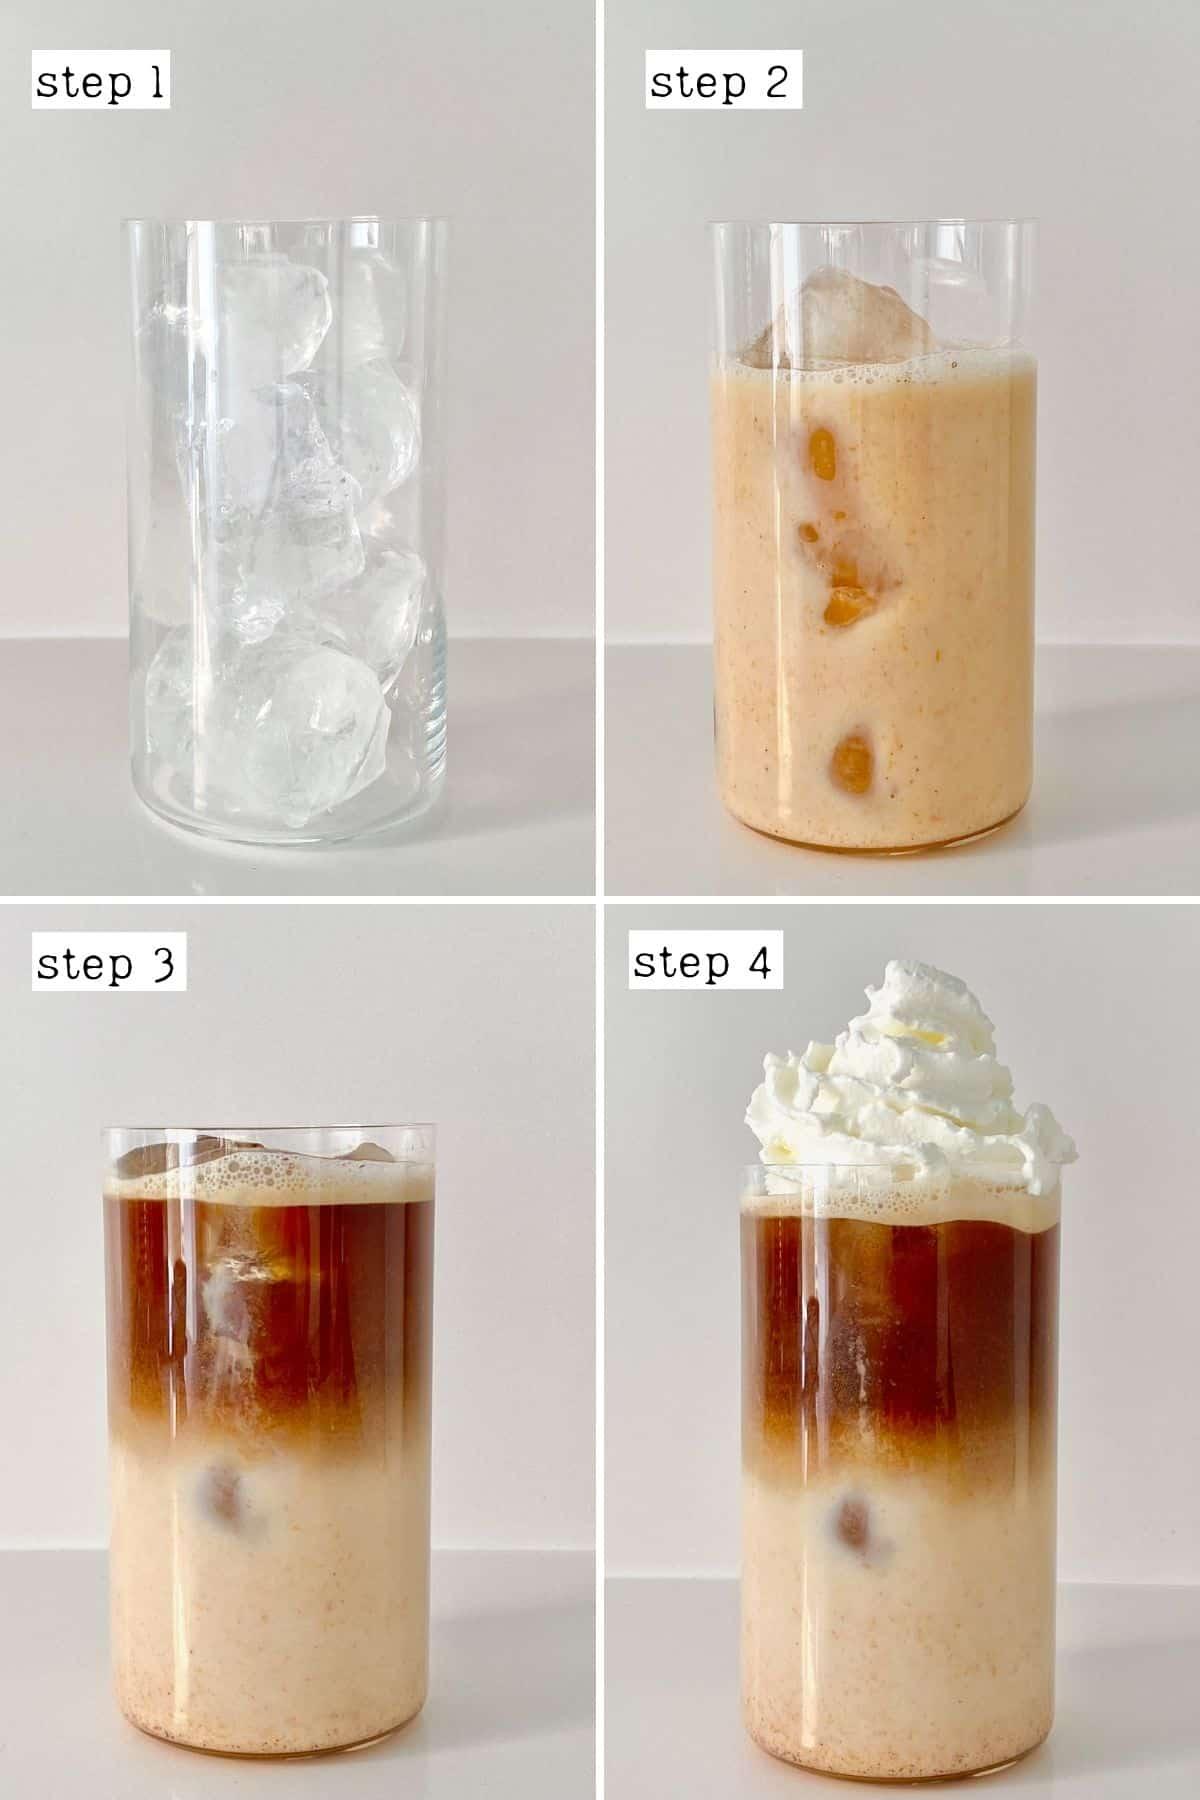 Steps for preparing iced pumpkin spice latte